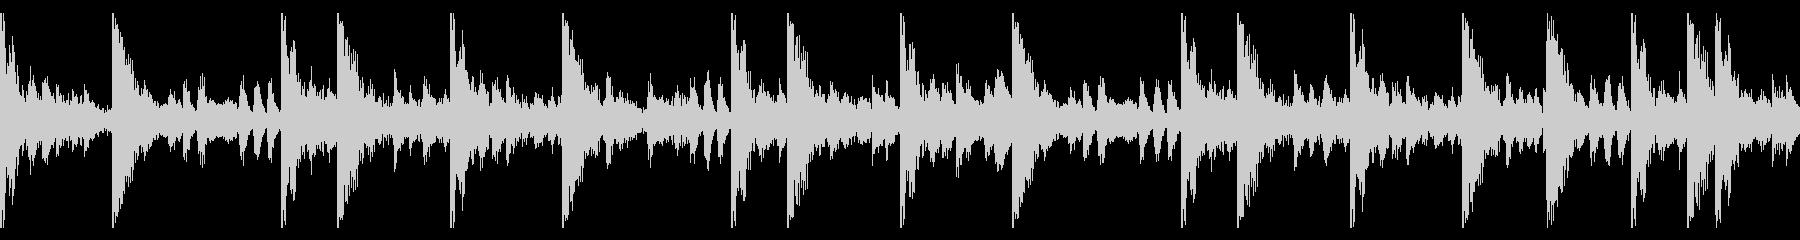 70 BPMの未再生の波形